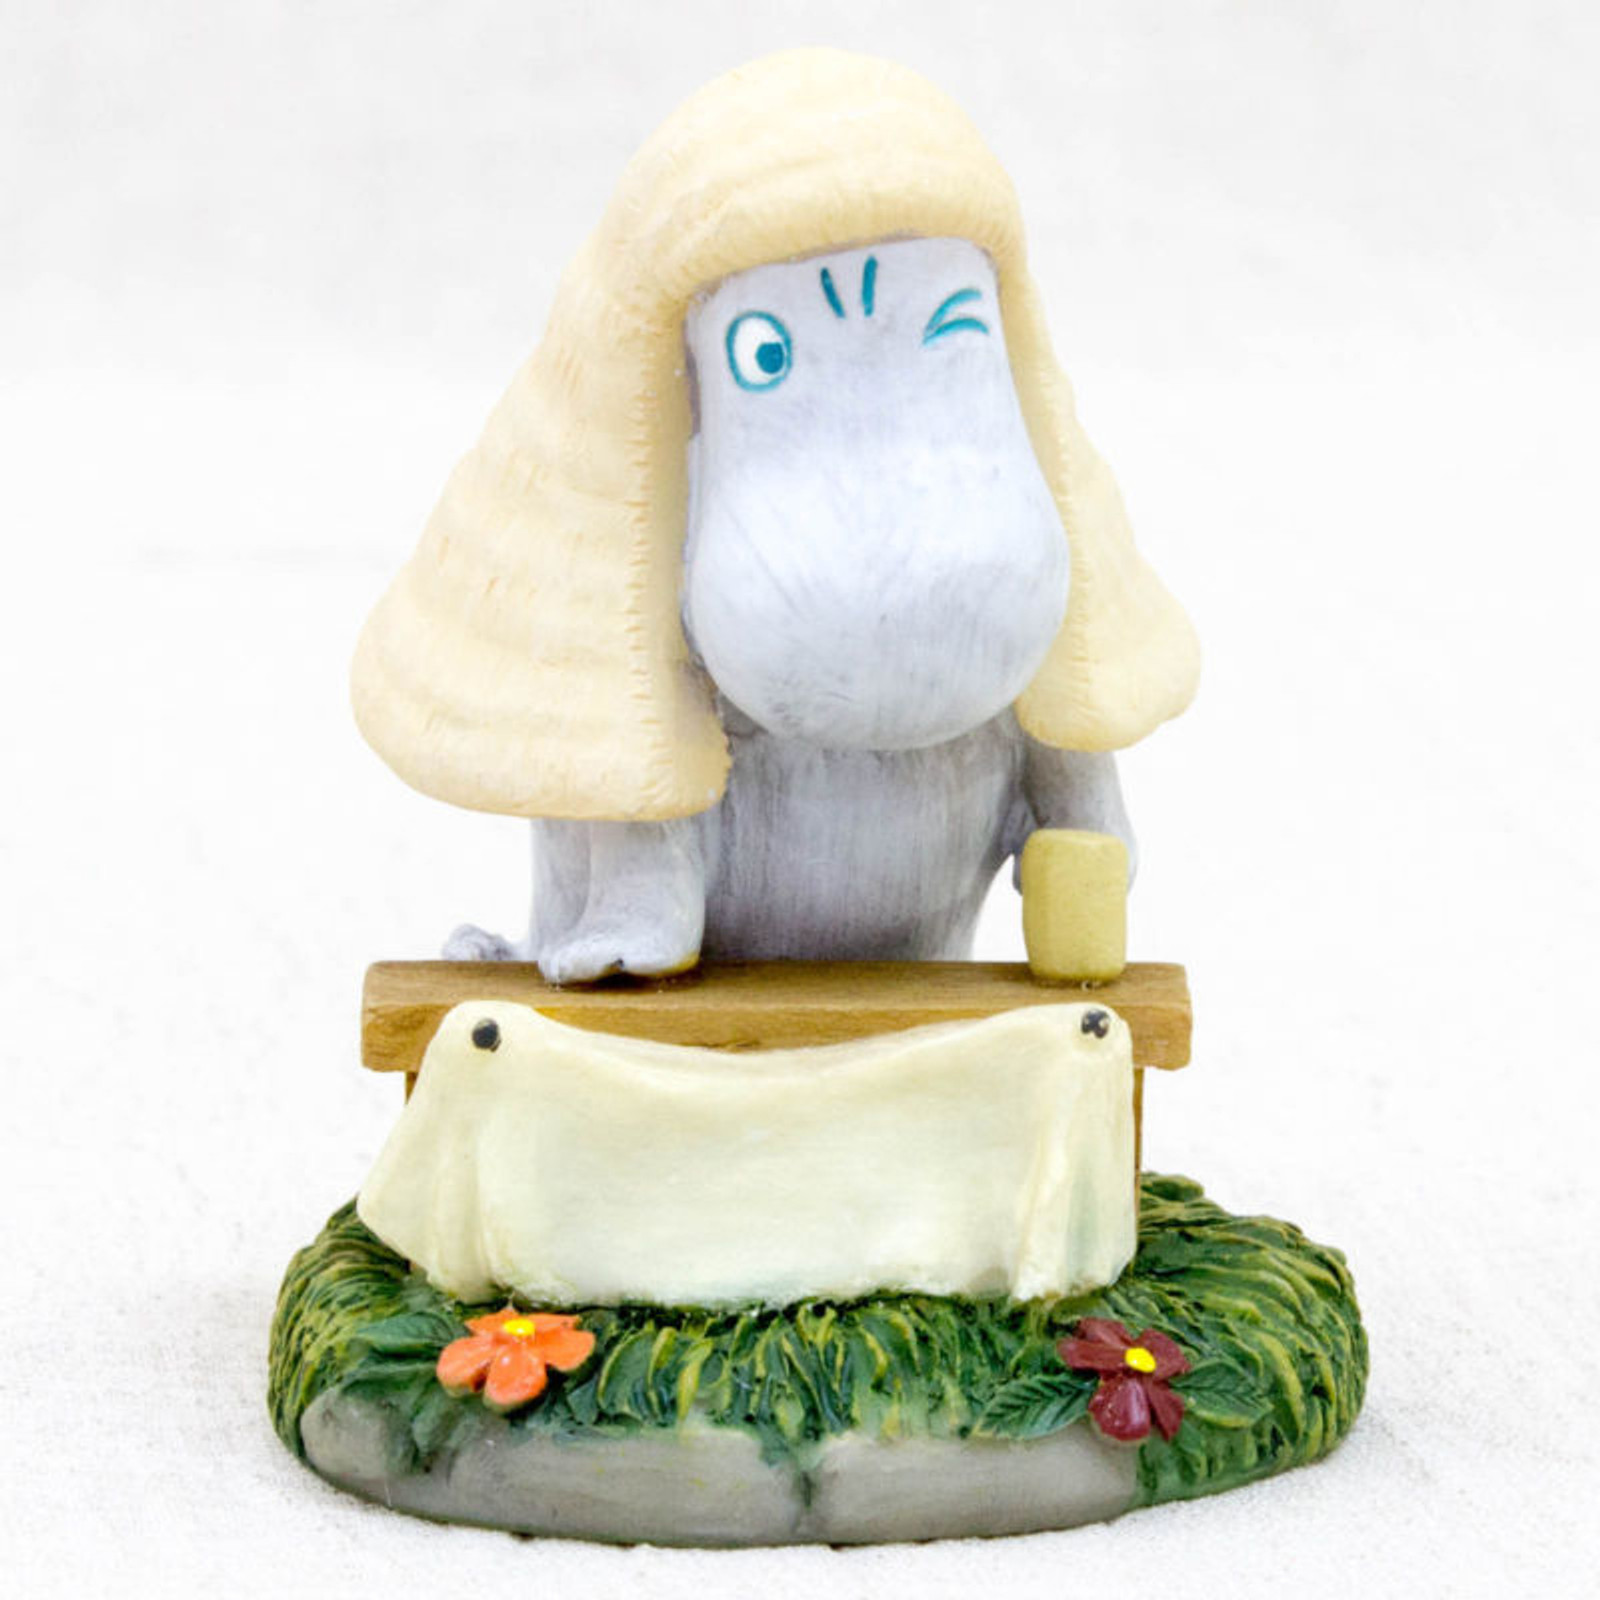 RARE! Moomin Characters Snork Original Comics Ver. Mini Figure Benelic